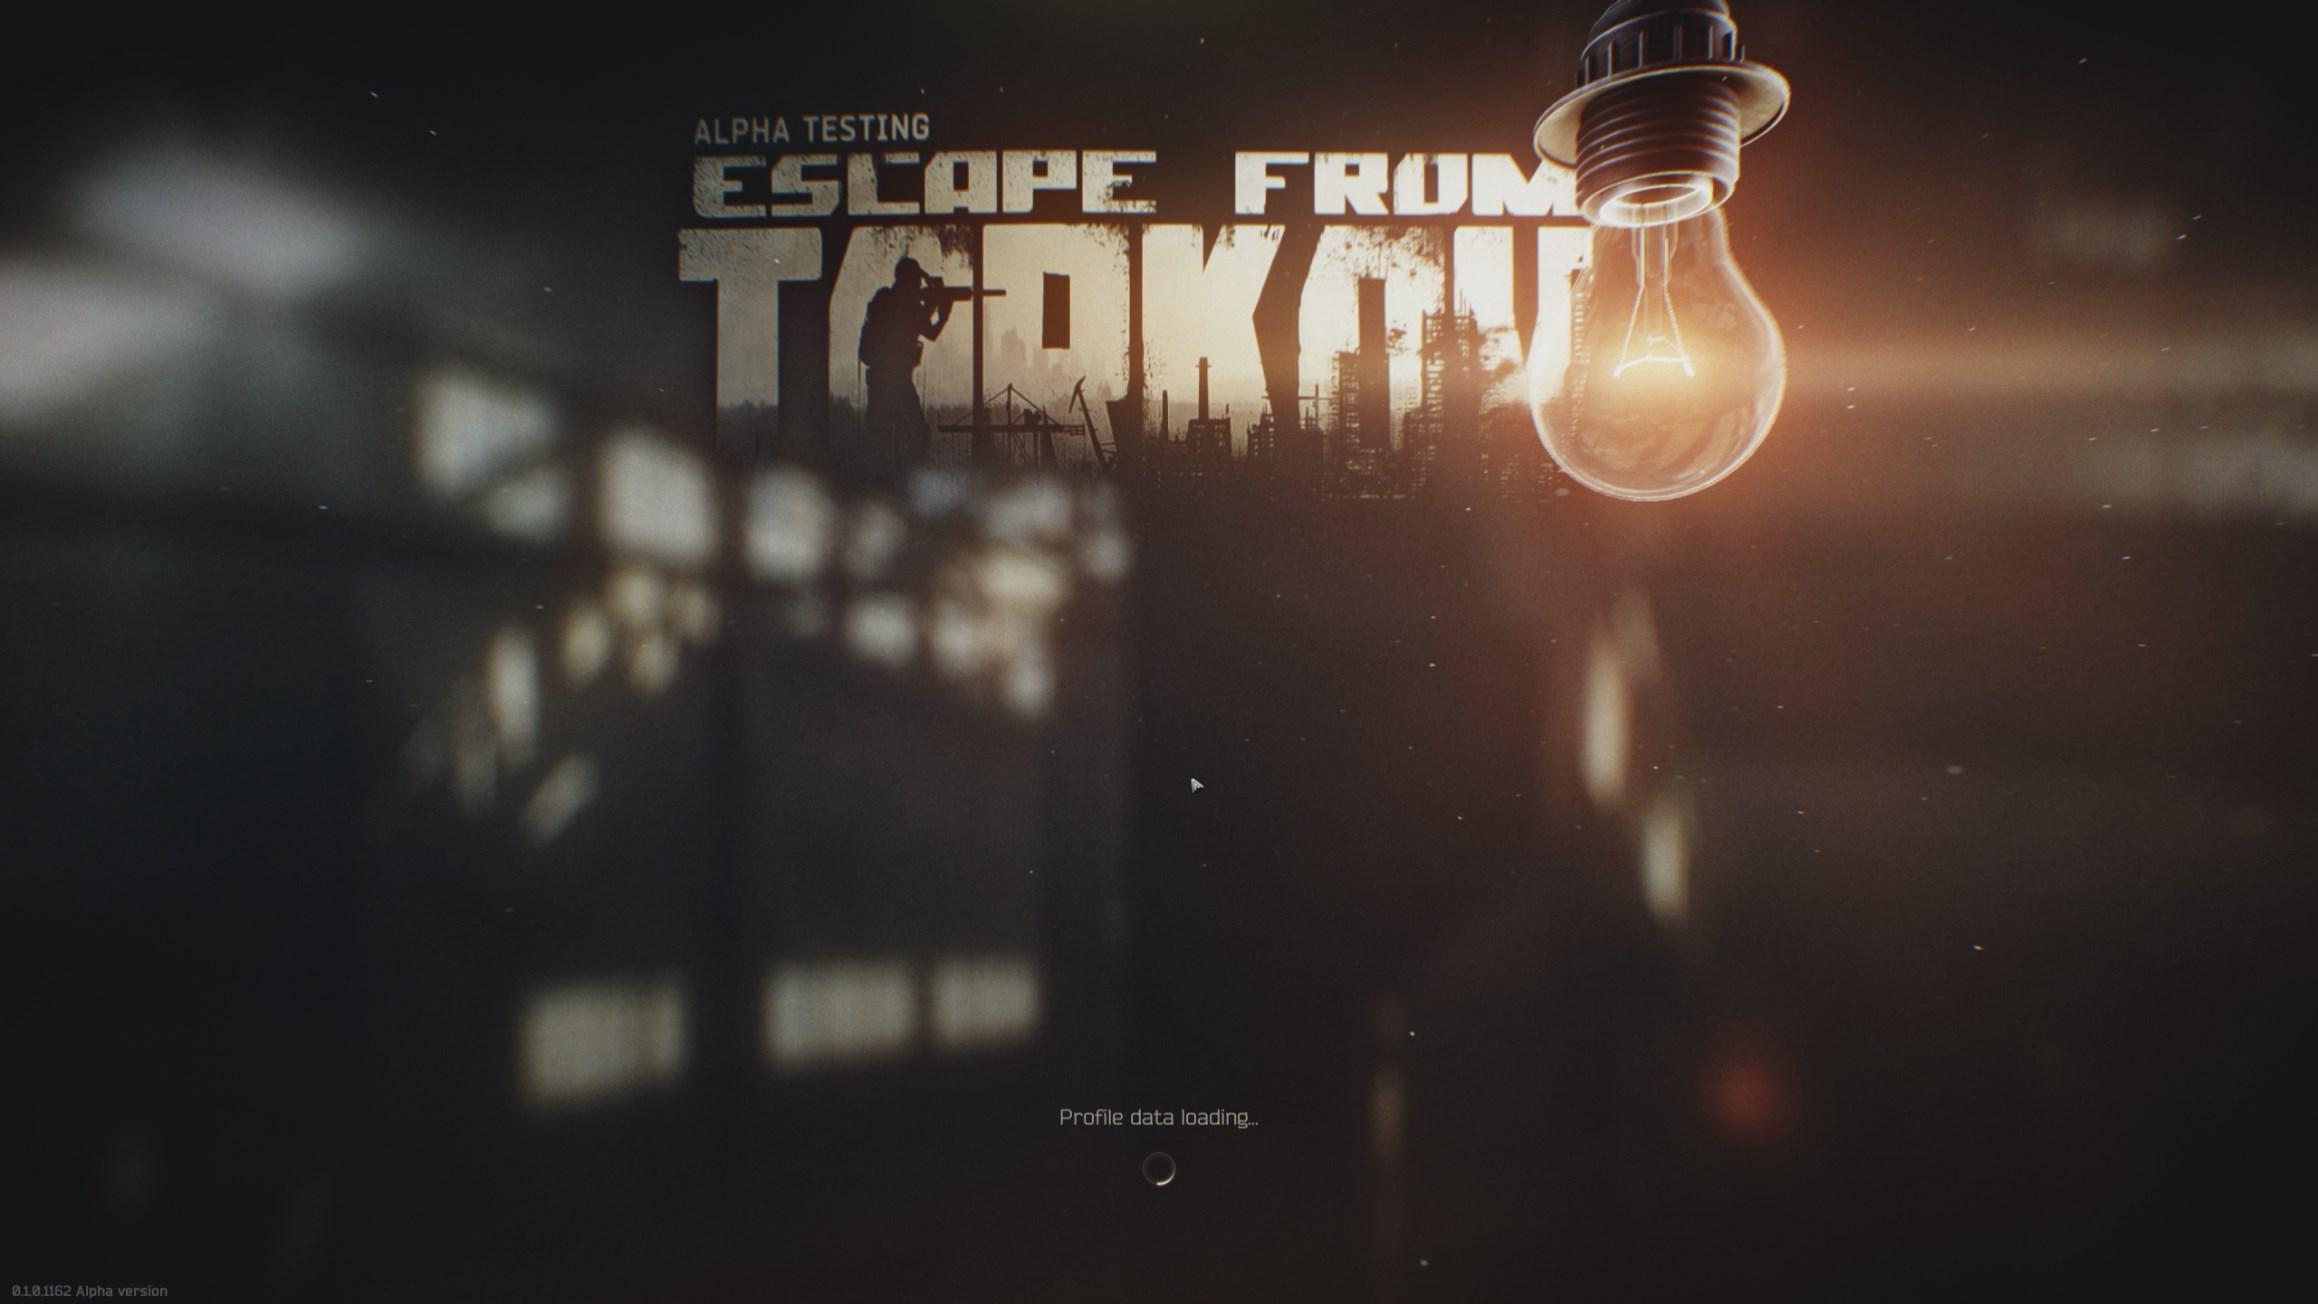 8xrjger Escape From Tarkov 1047377 Hd Wallpaper